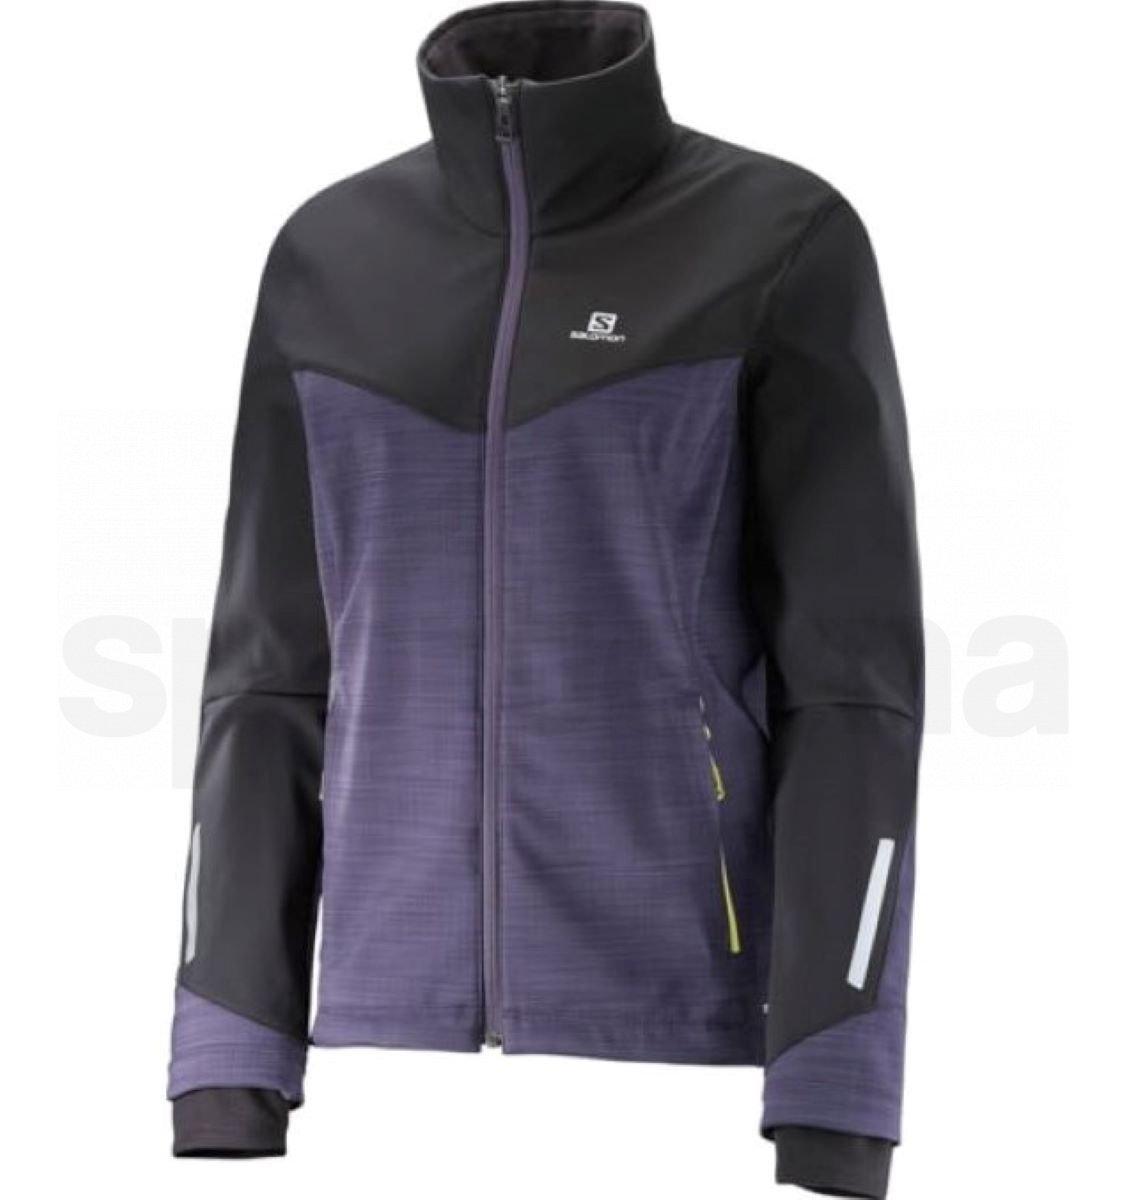 salomon-pulse-softshell-jacket-women-s-nightshade-grey-black-large